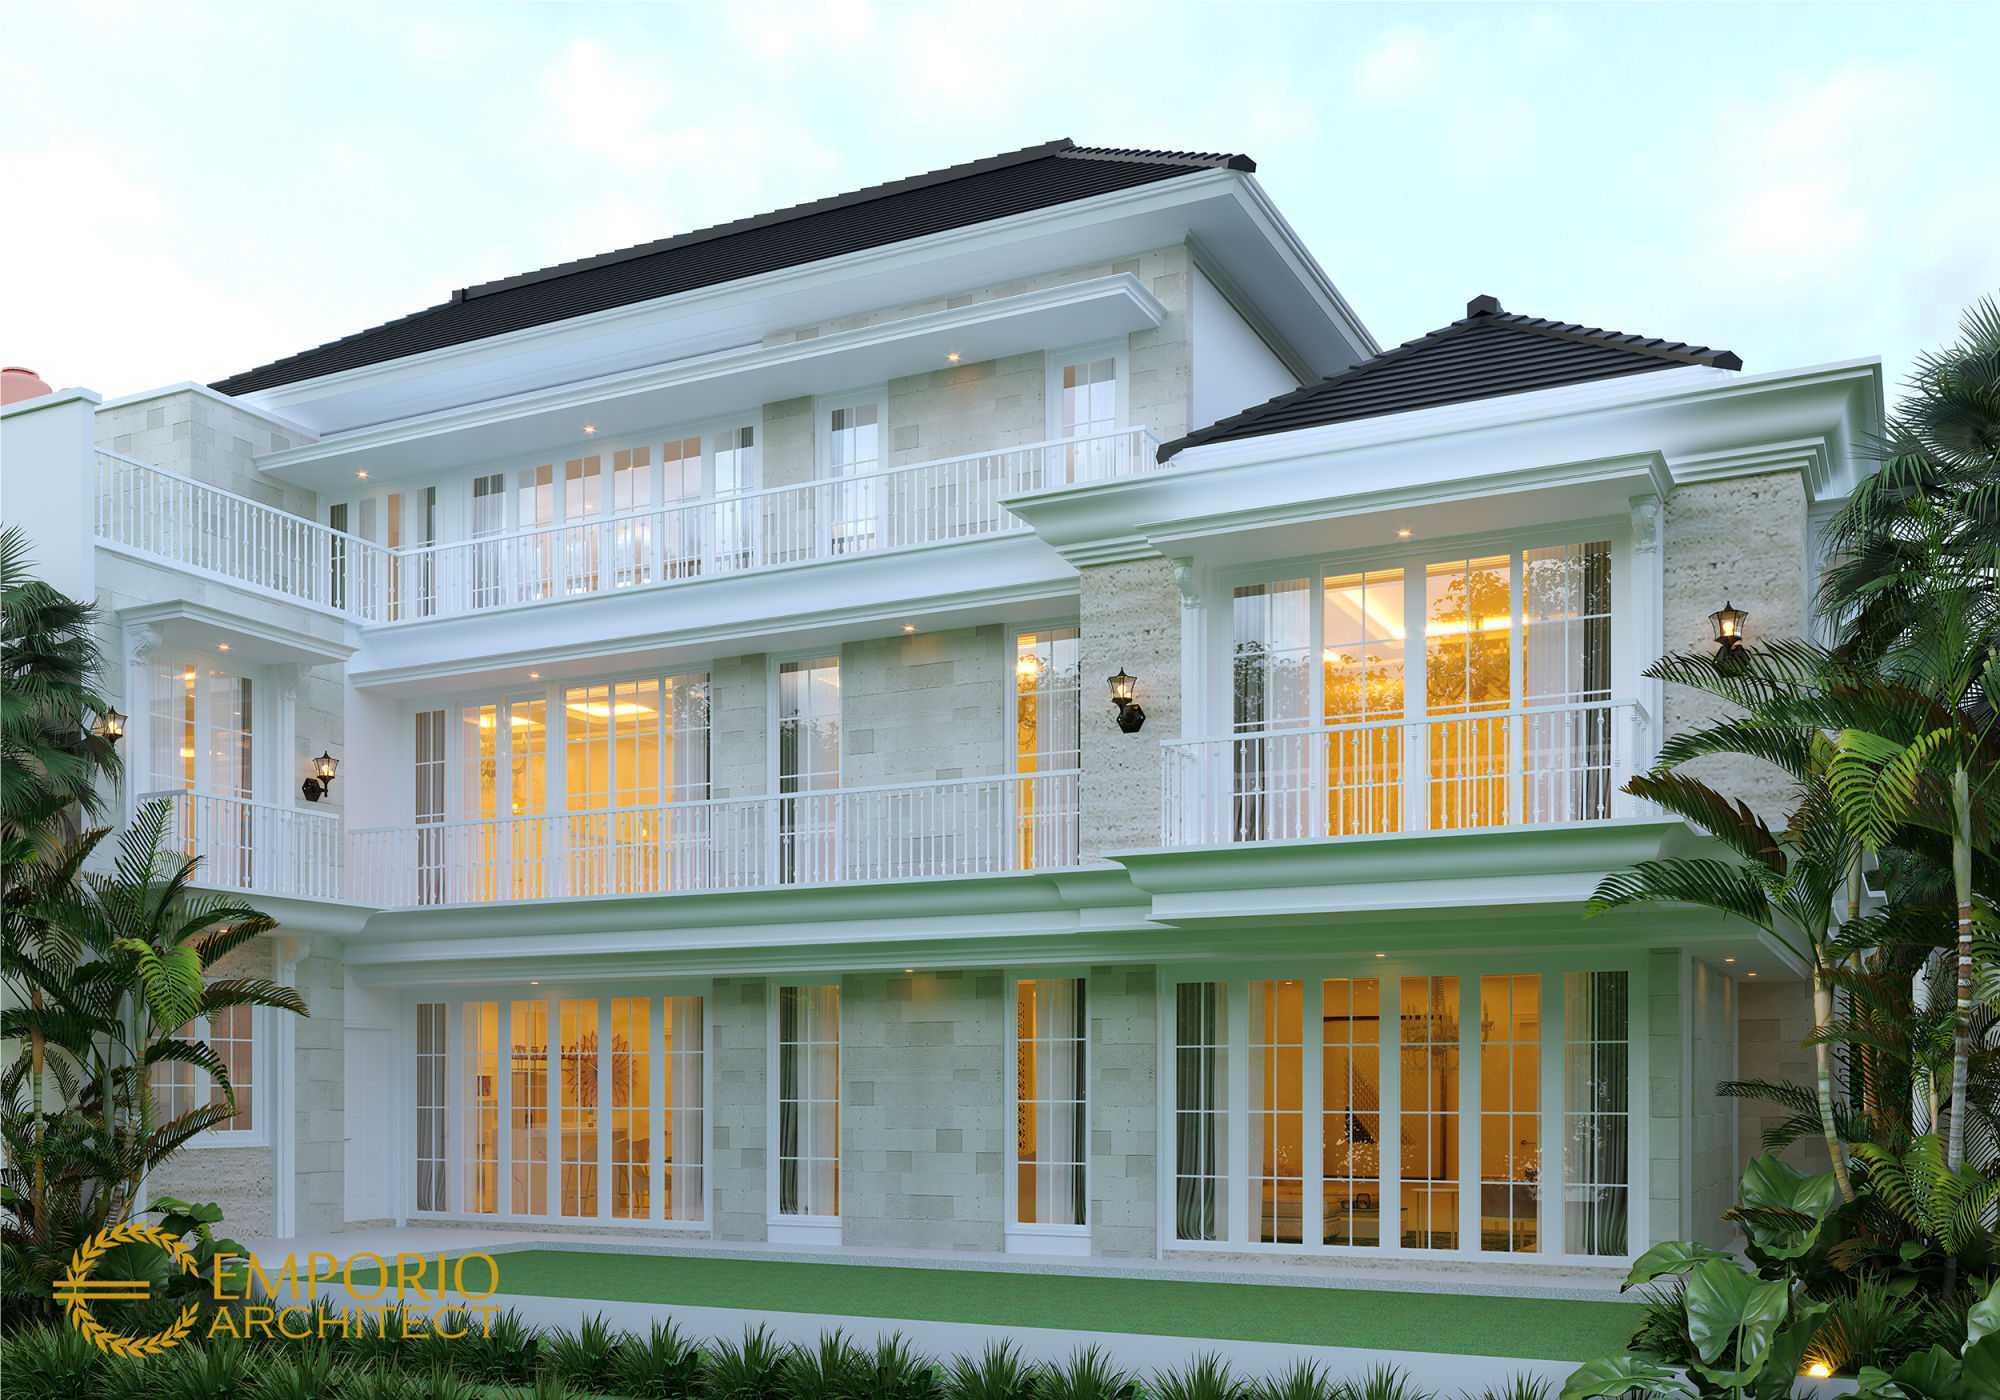 Emporio Architect Jasa Arsitek Bekasi Desain Rumah Classic Tropis 644 @ Bekasi, Jawa Barat Bekasi, Kota Bks, Jawa Barat, Indonesia Bekasi, Kota Bks, Jawa Barat, Indonesia Emporio-Architect-Jasa-Arsitek-Bekasi-Desain-Rumah-Classic-Tropis-644-Bekasi-Jawa-Barat   79682